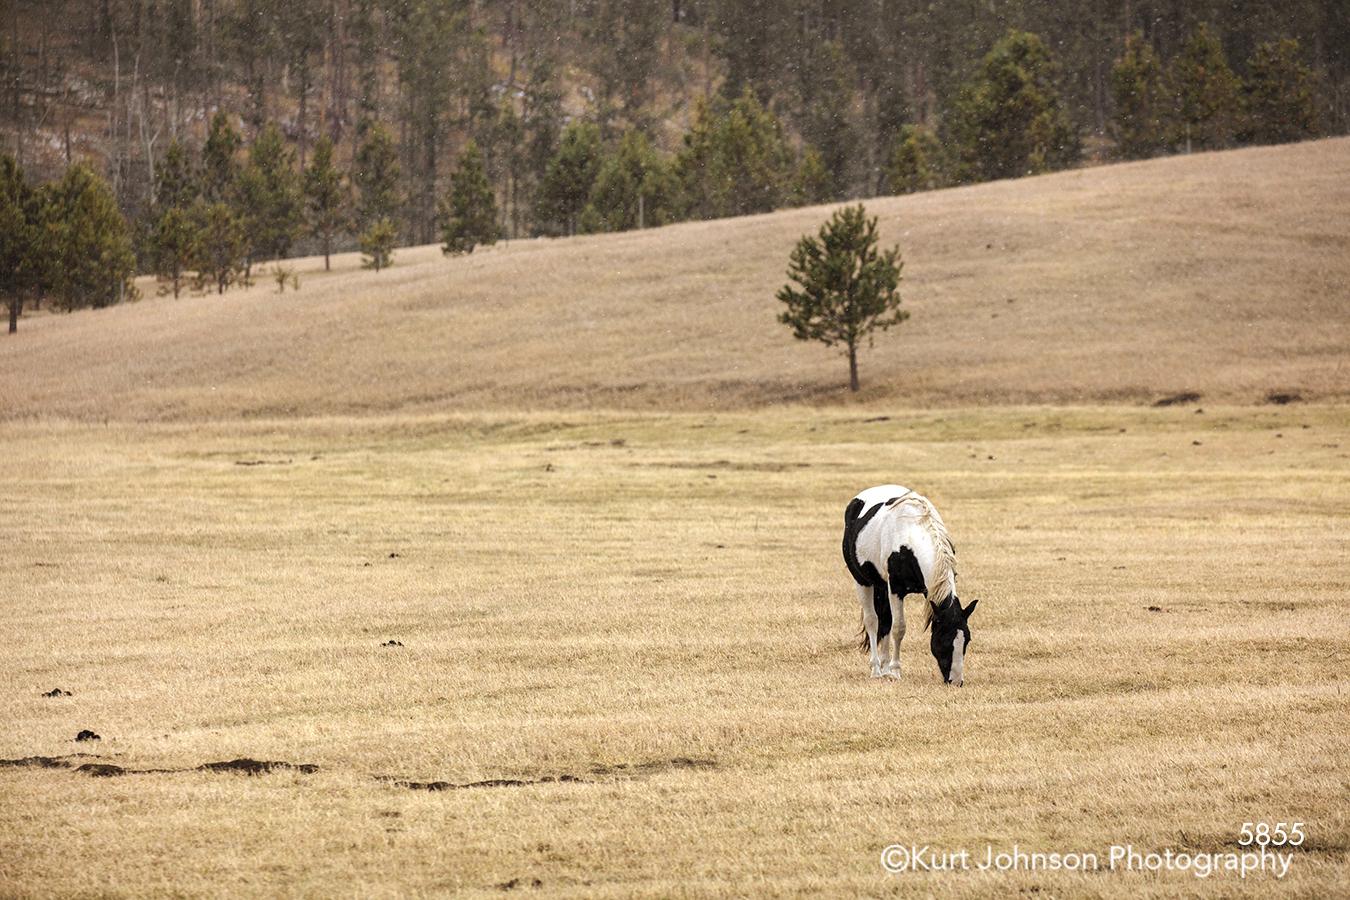 open field farm white black horse grazing farmland country landscape animal wildlife